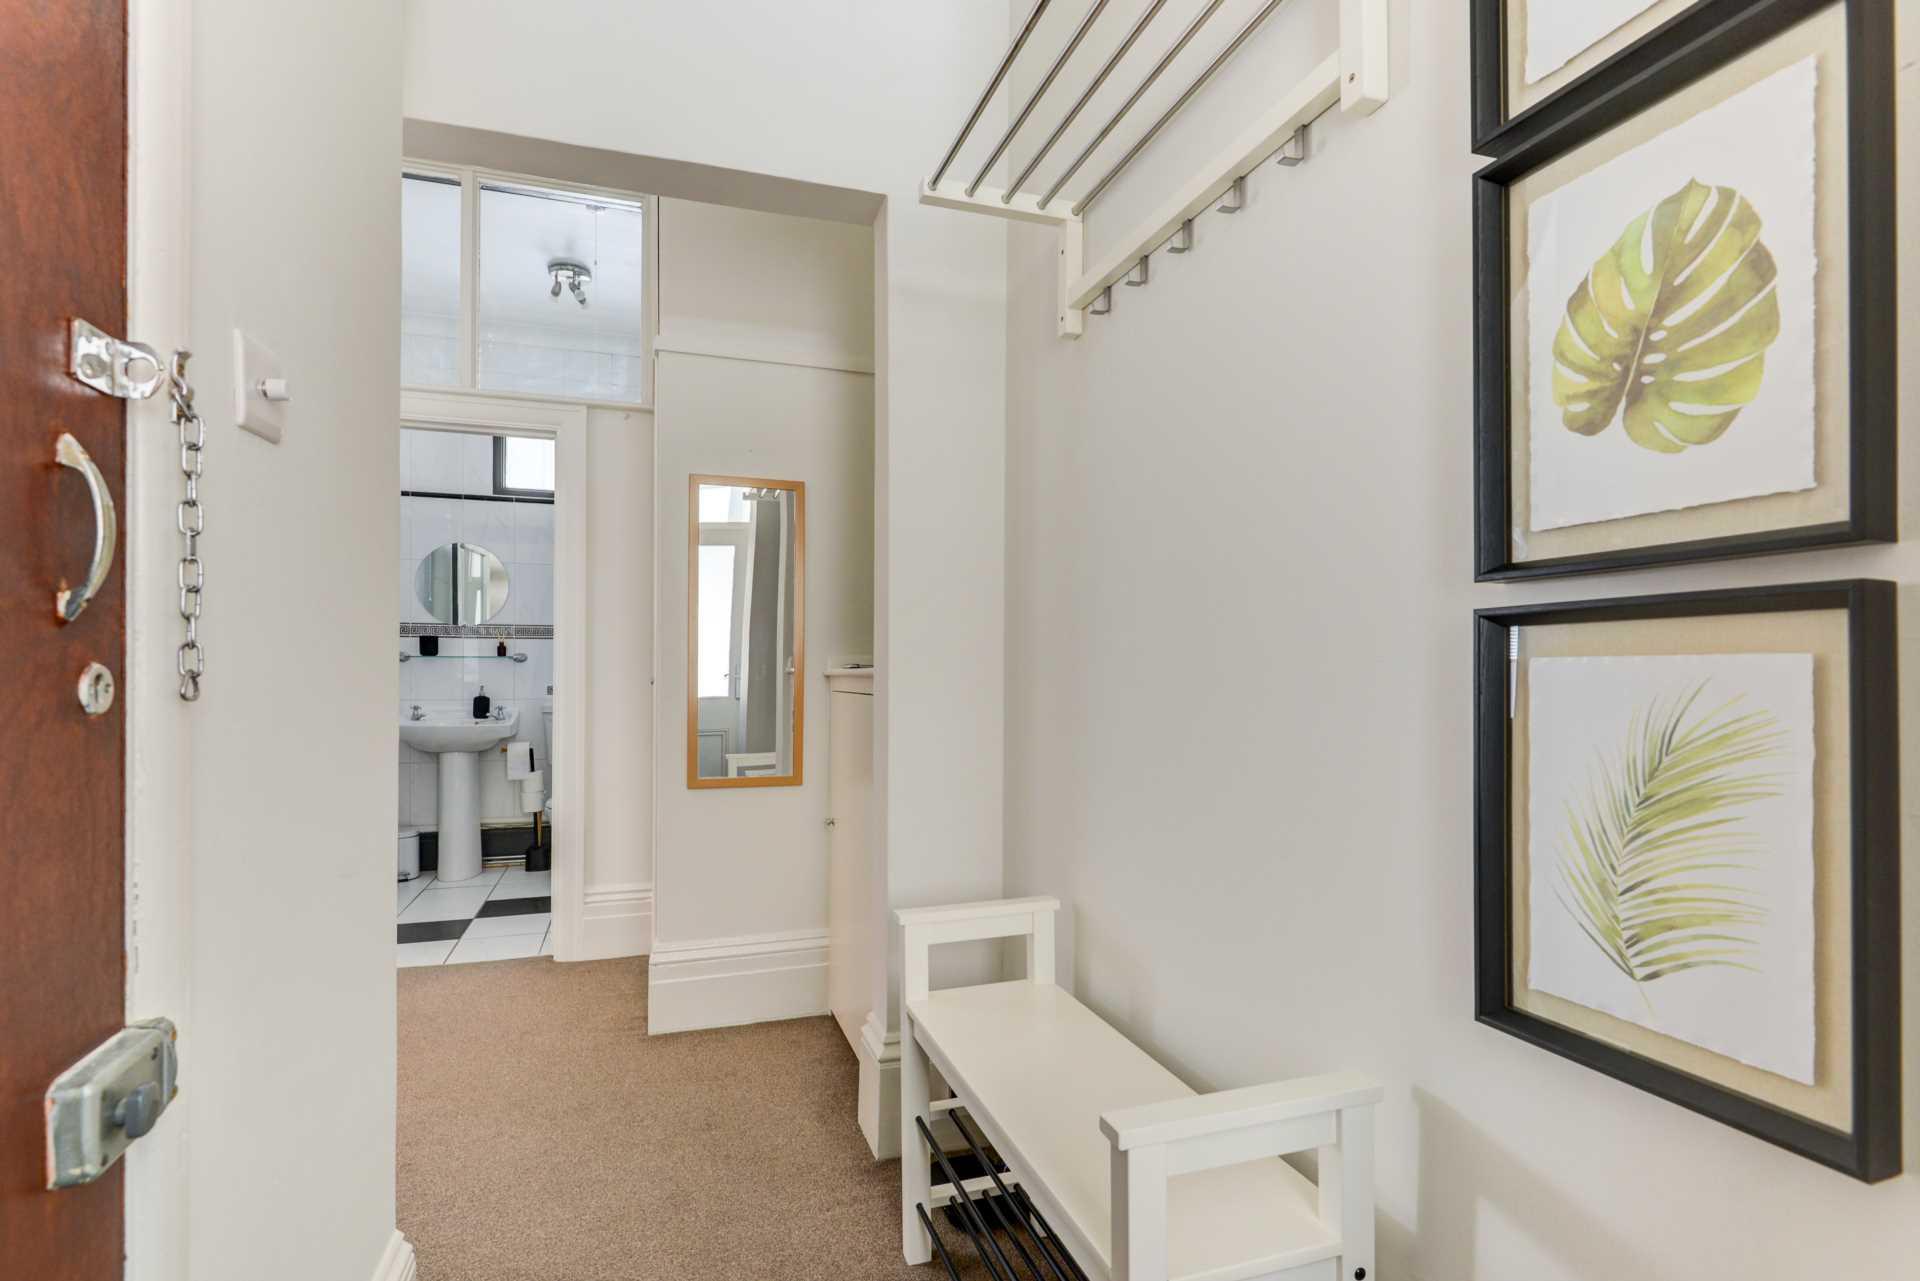 St Aubyns Studio, Image 20